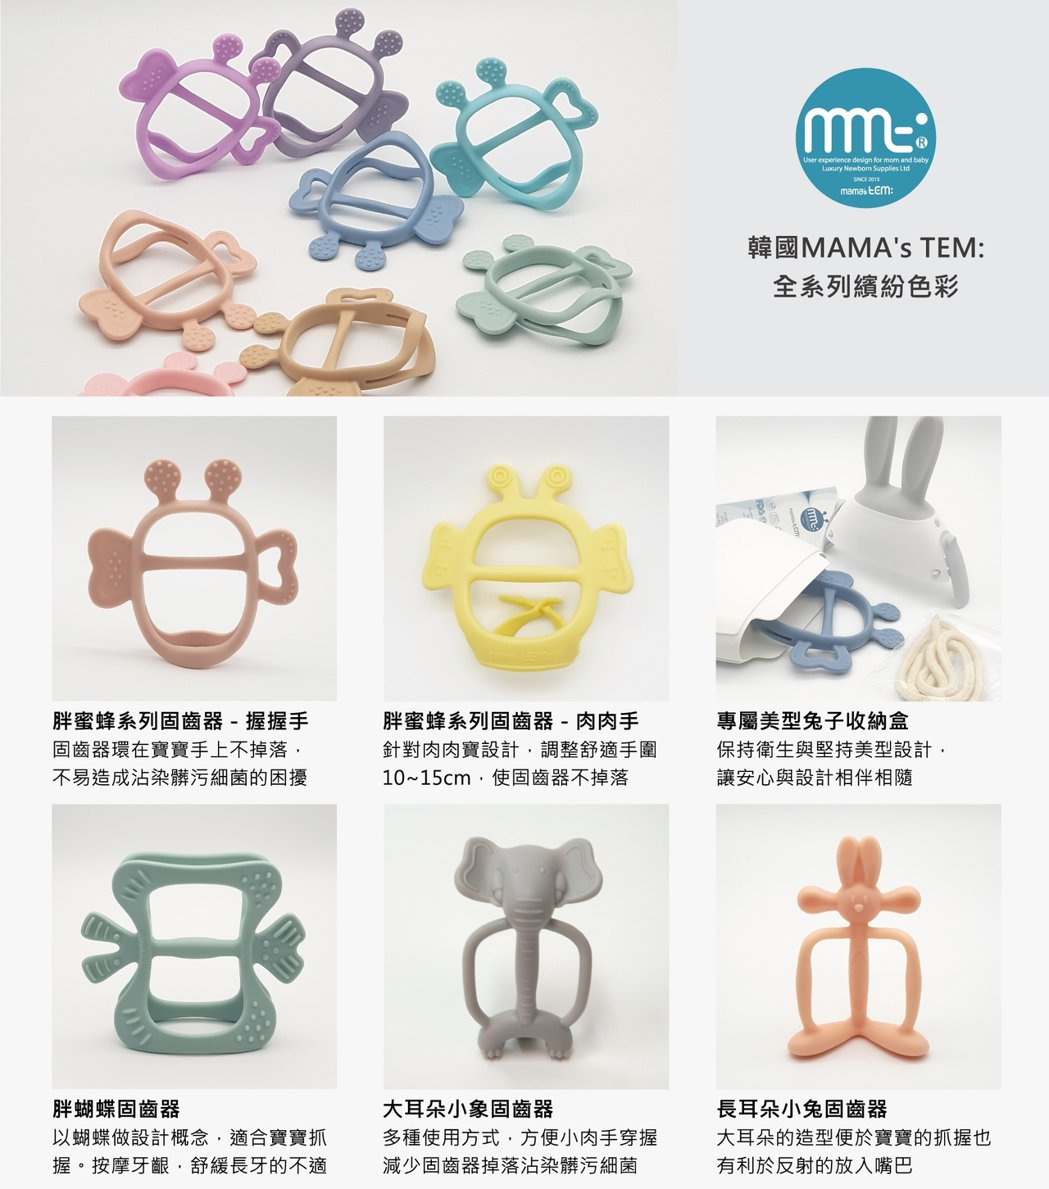 mama's tem固齒器兼顧功能性和設計美學,包括顏色和形狀都是專業團隊經過多...